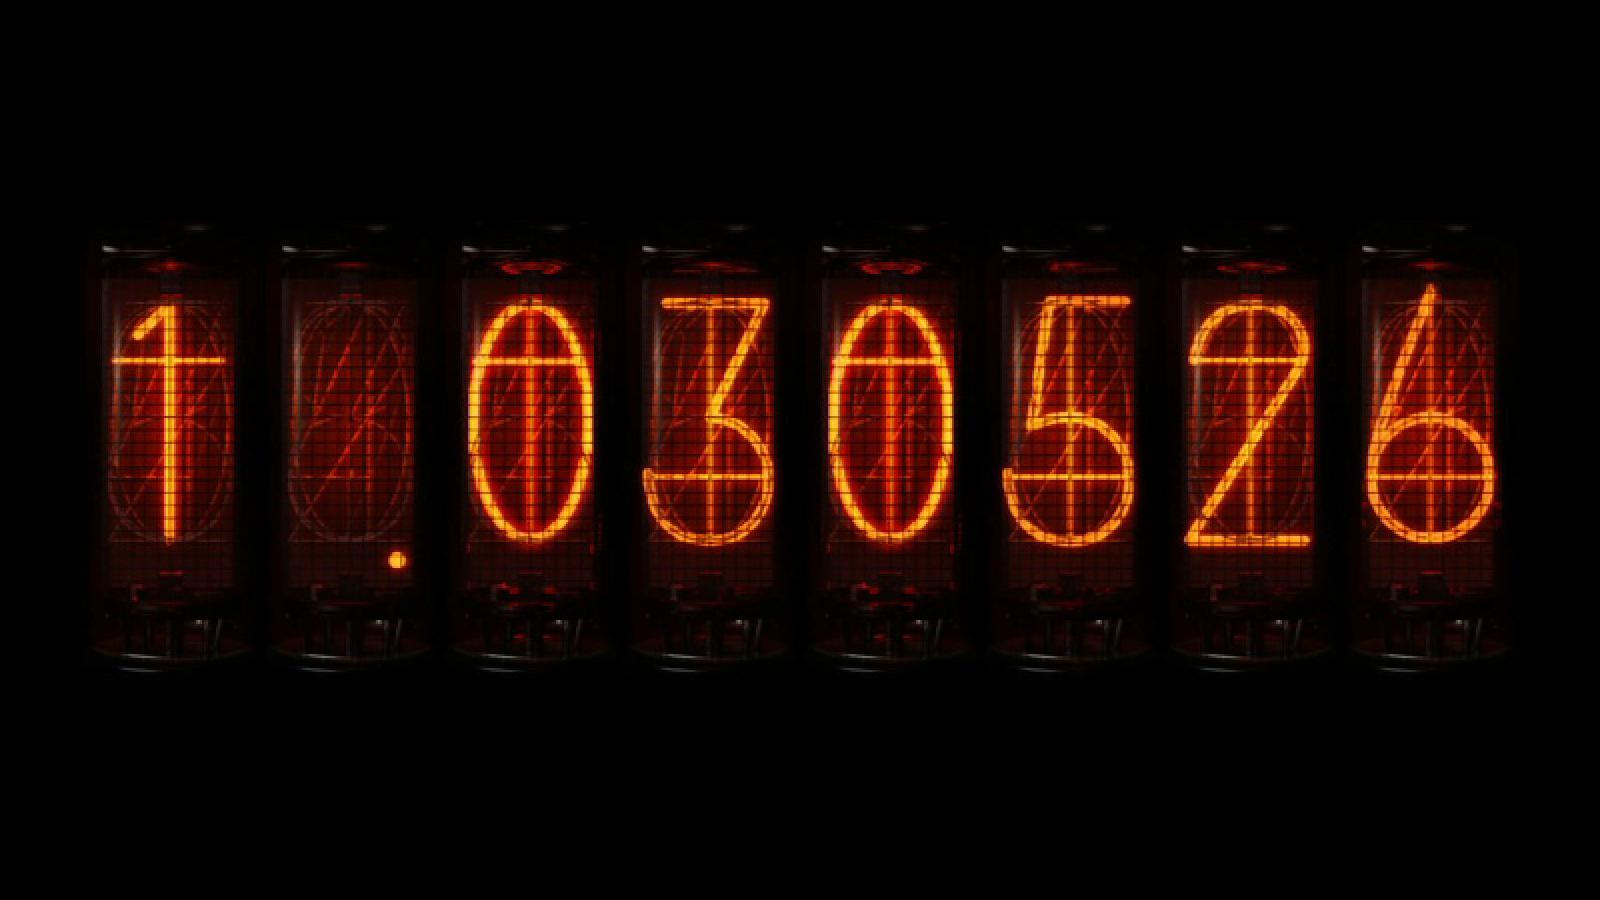 SteinsGate Computer Wallpapers Desktop Backgrounds 1600x900 ID 1600x900